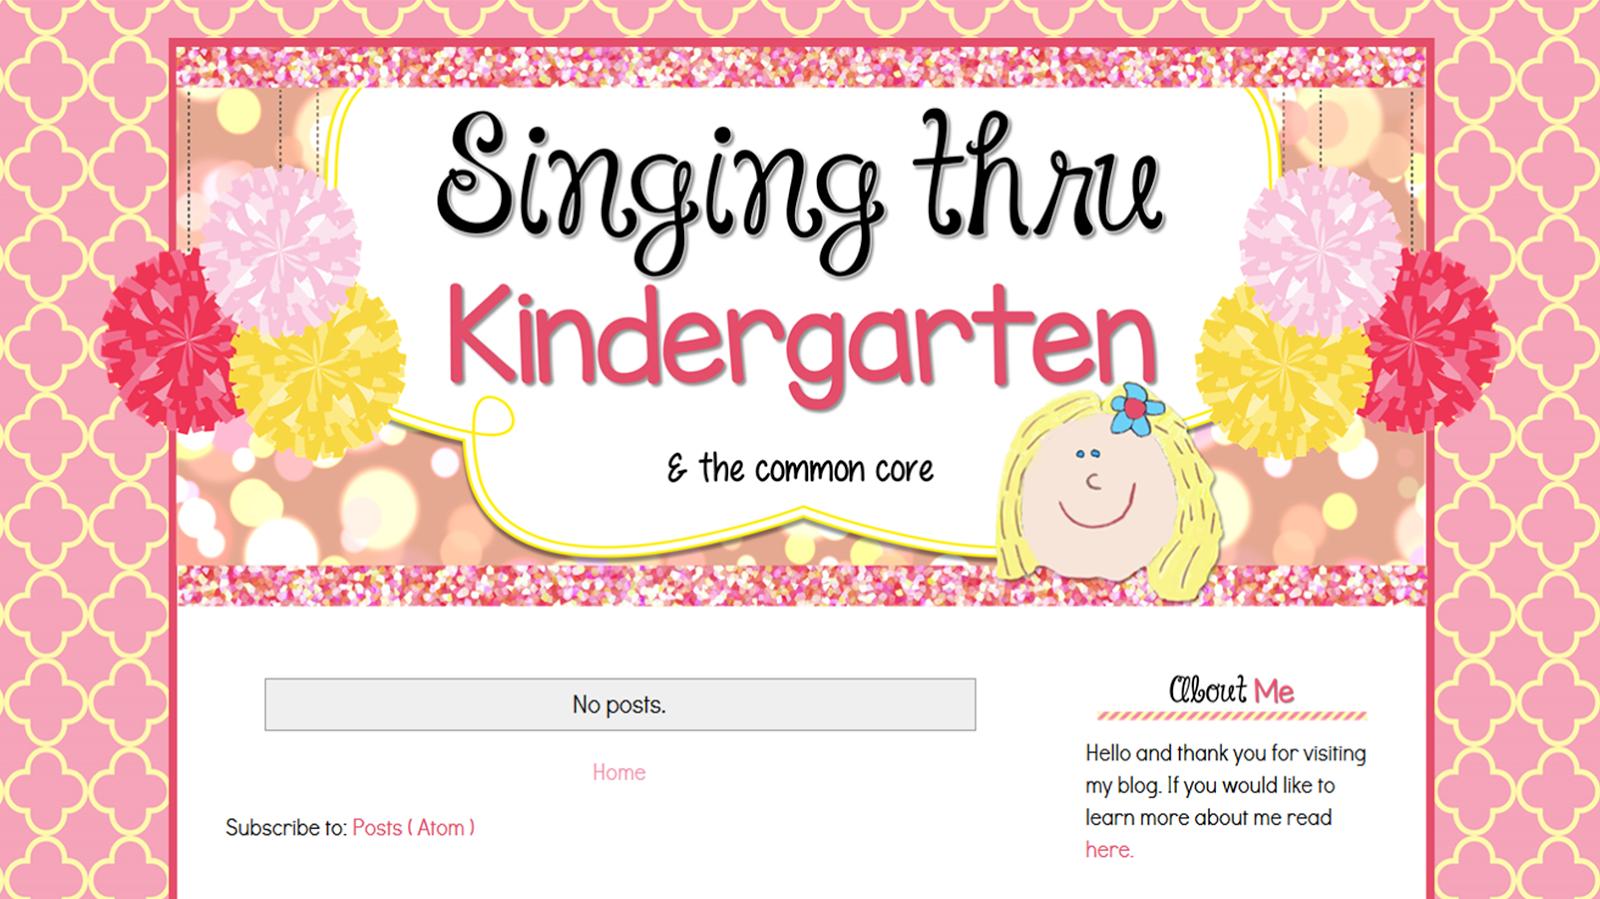 http://singingthrukindergarten.blogspot.com/